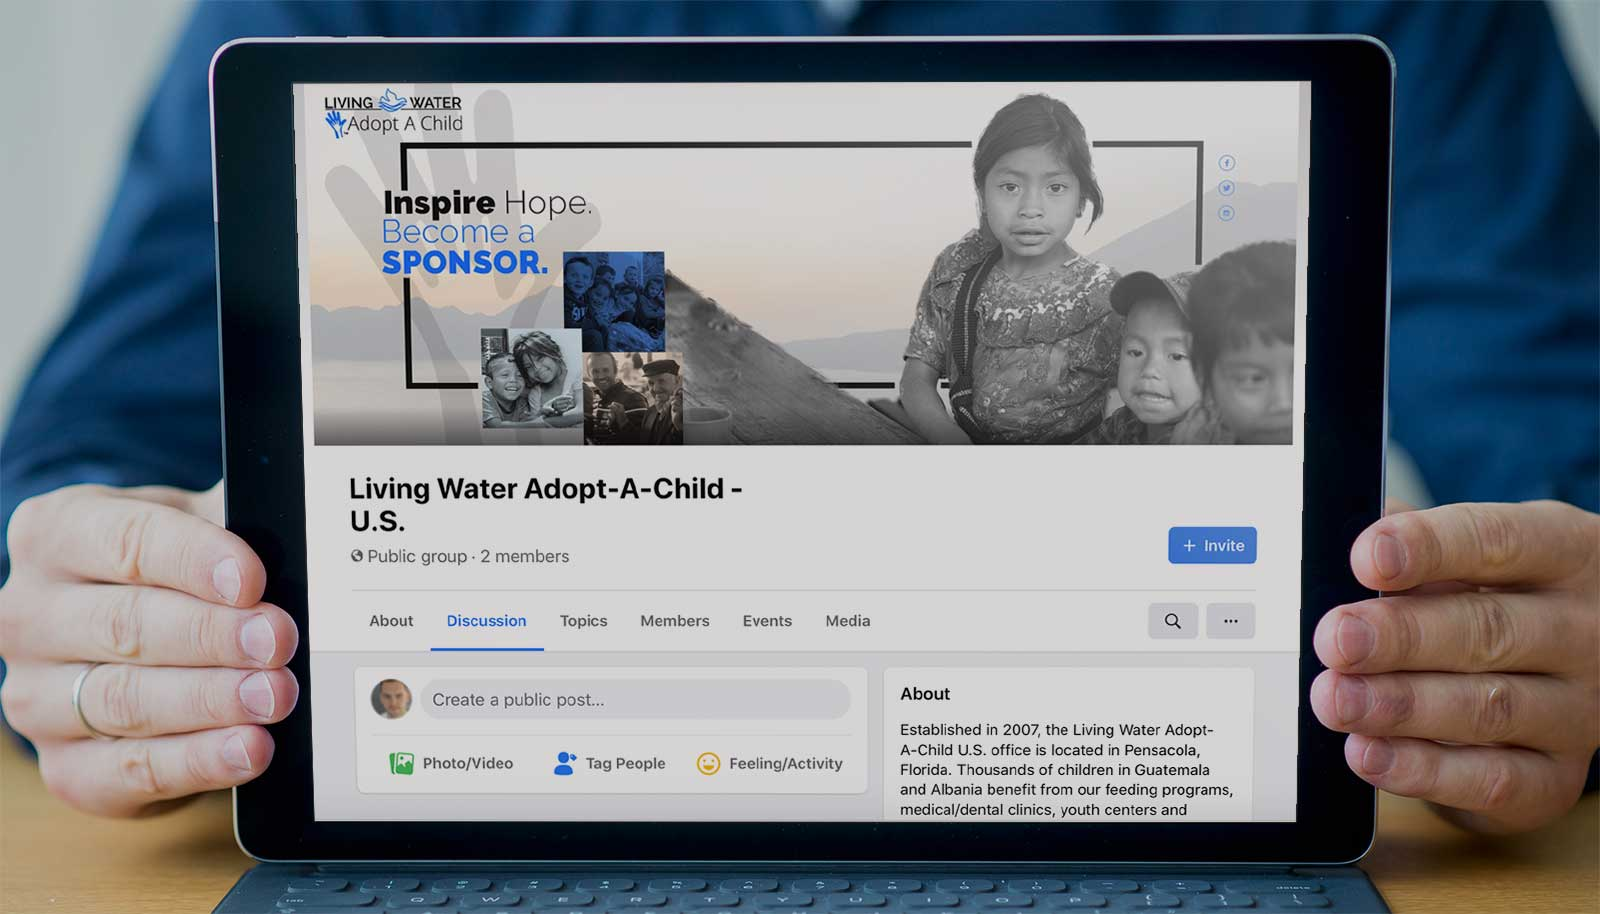 Living Water Adopt-A-Child Gruppo Facebook USA